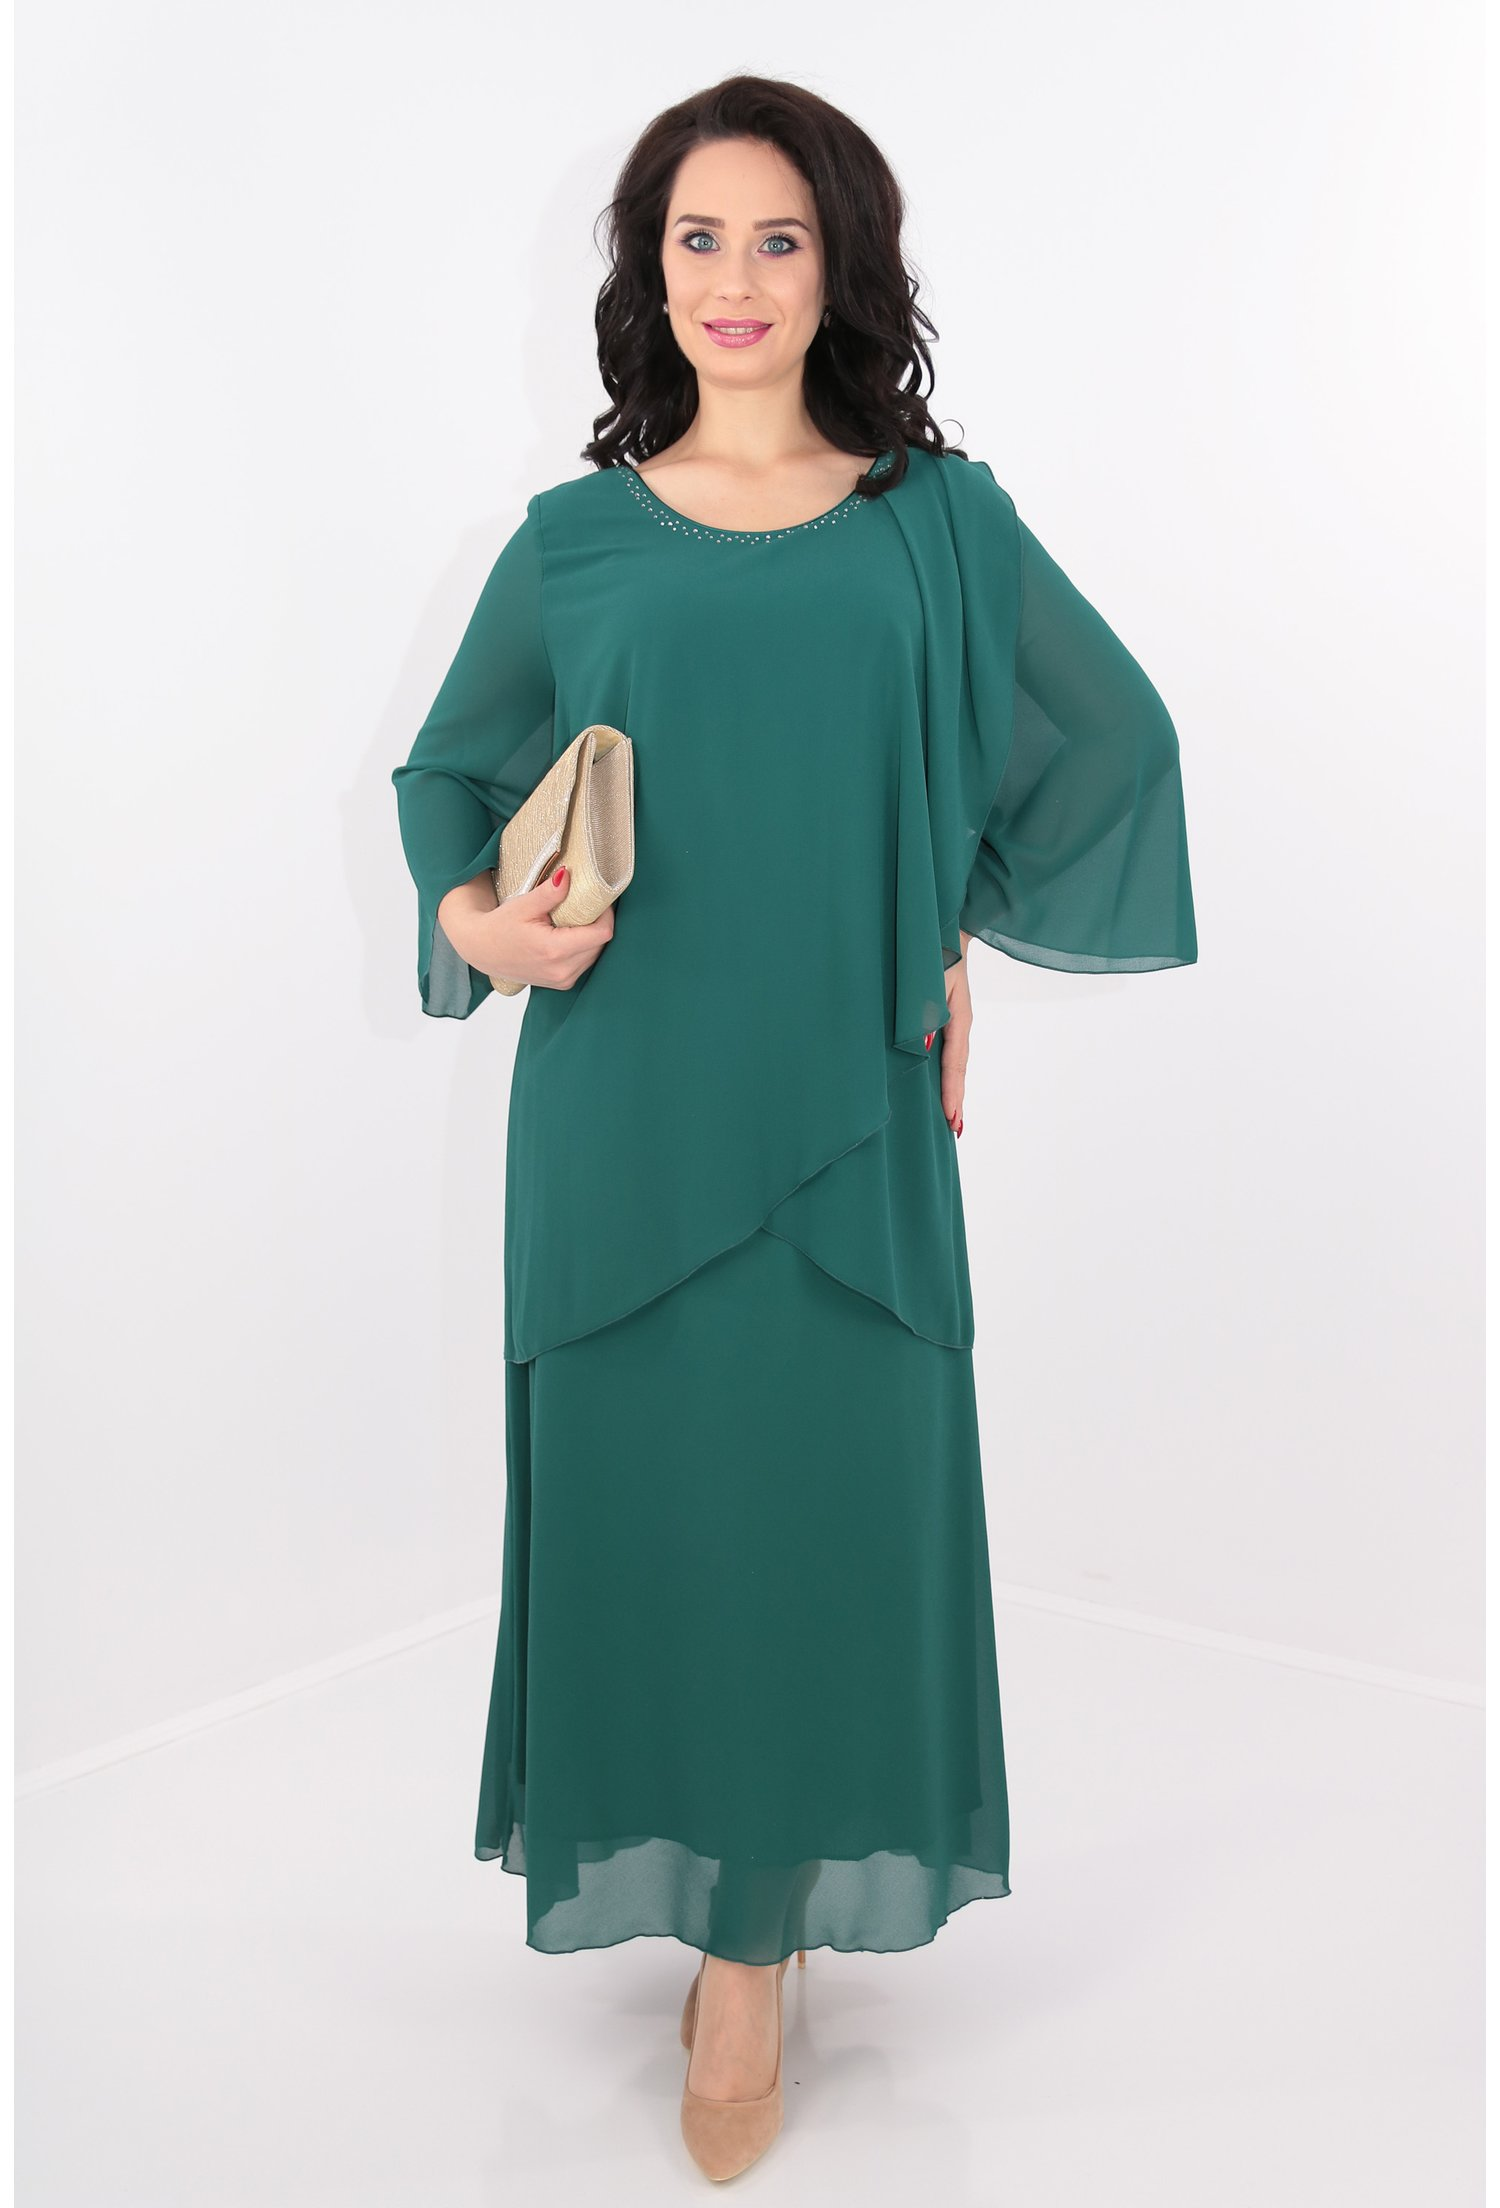 Rochie verde din voal cu strasuri argintii